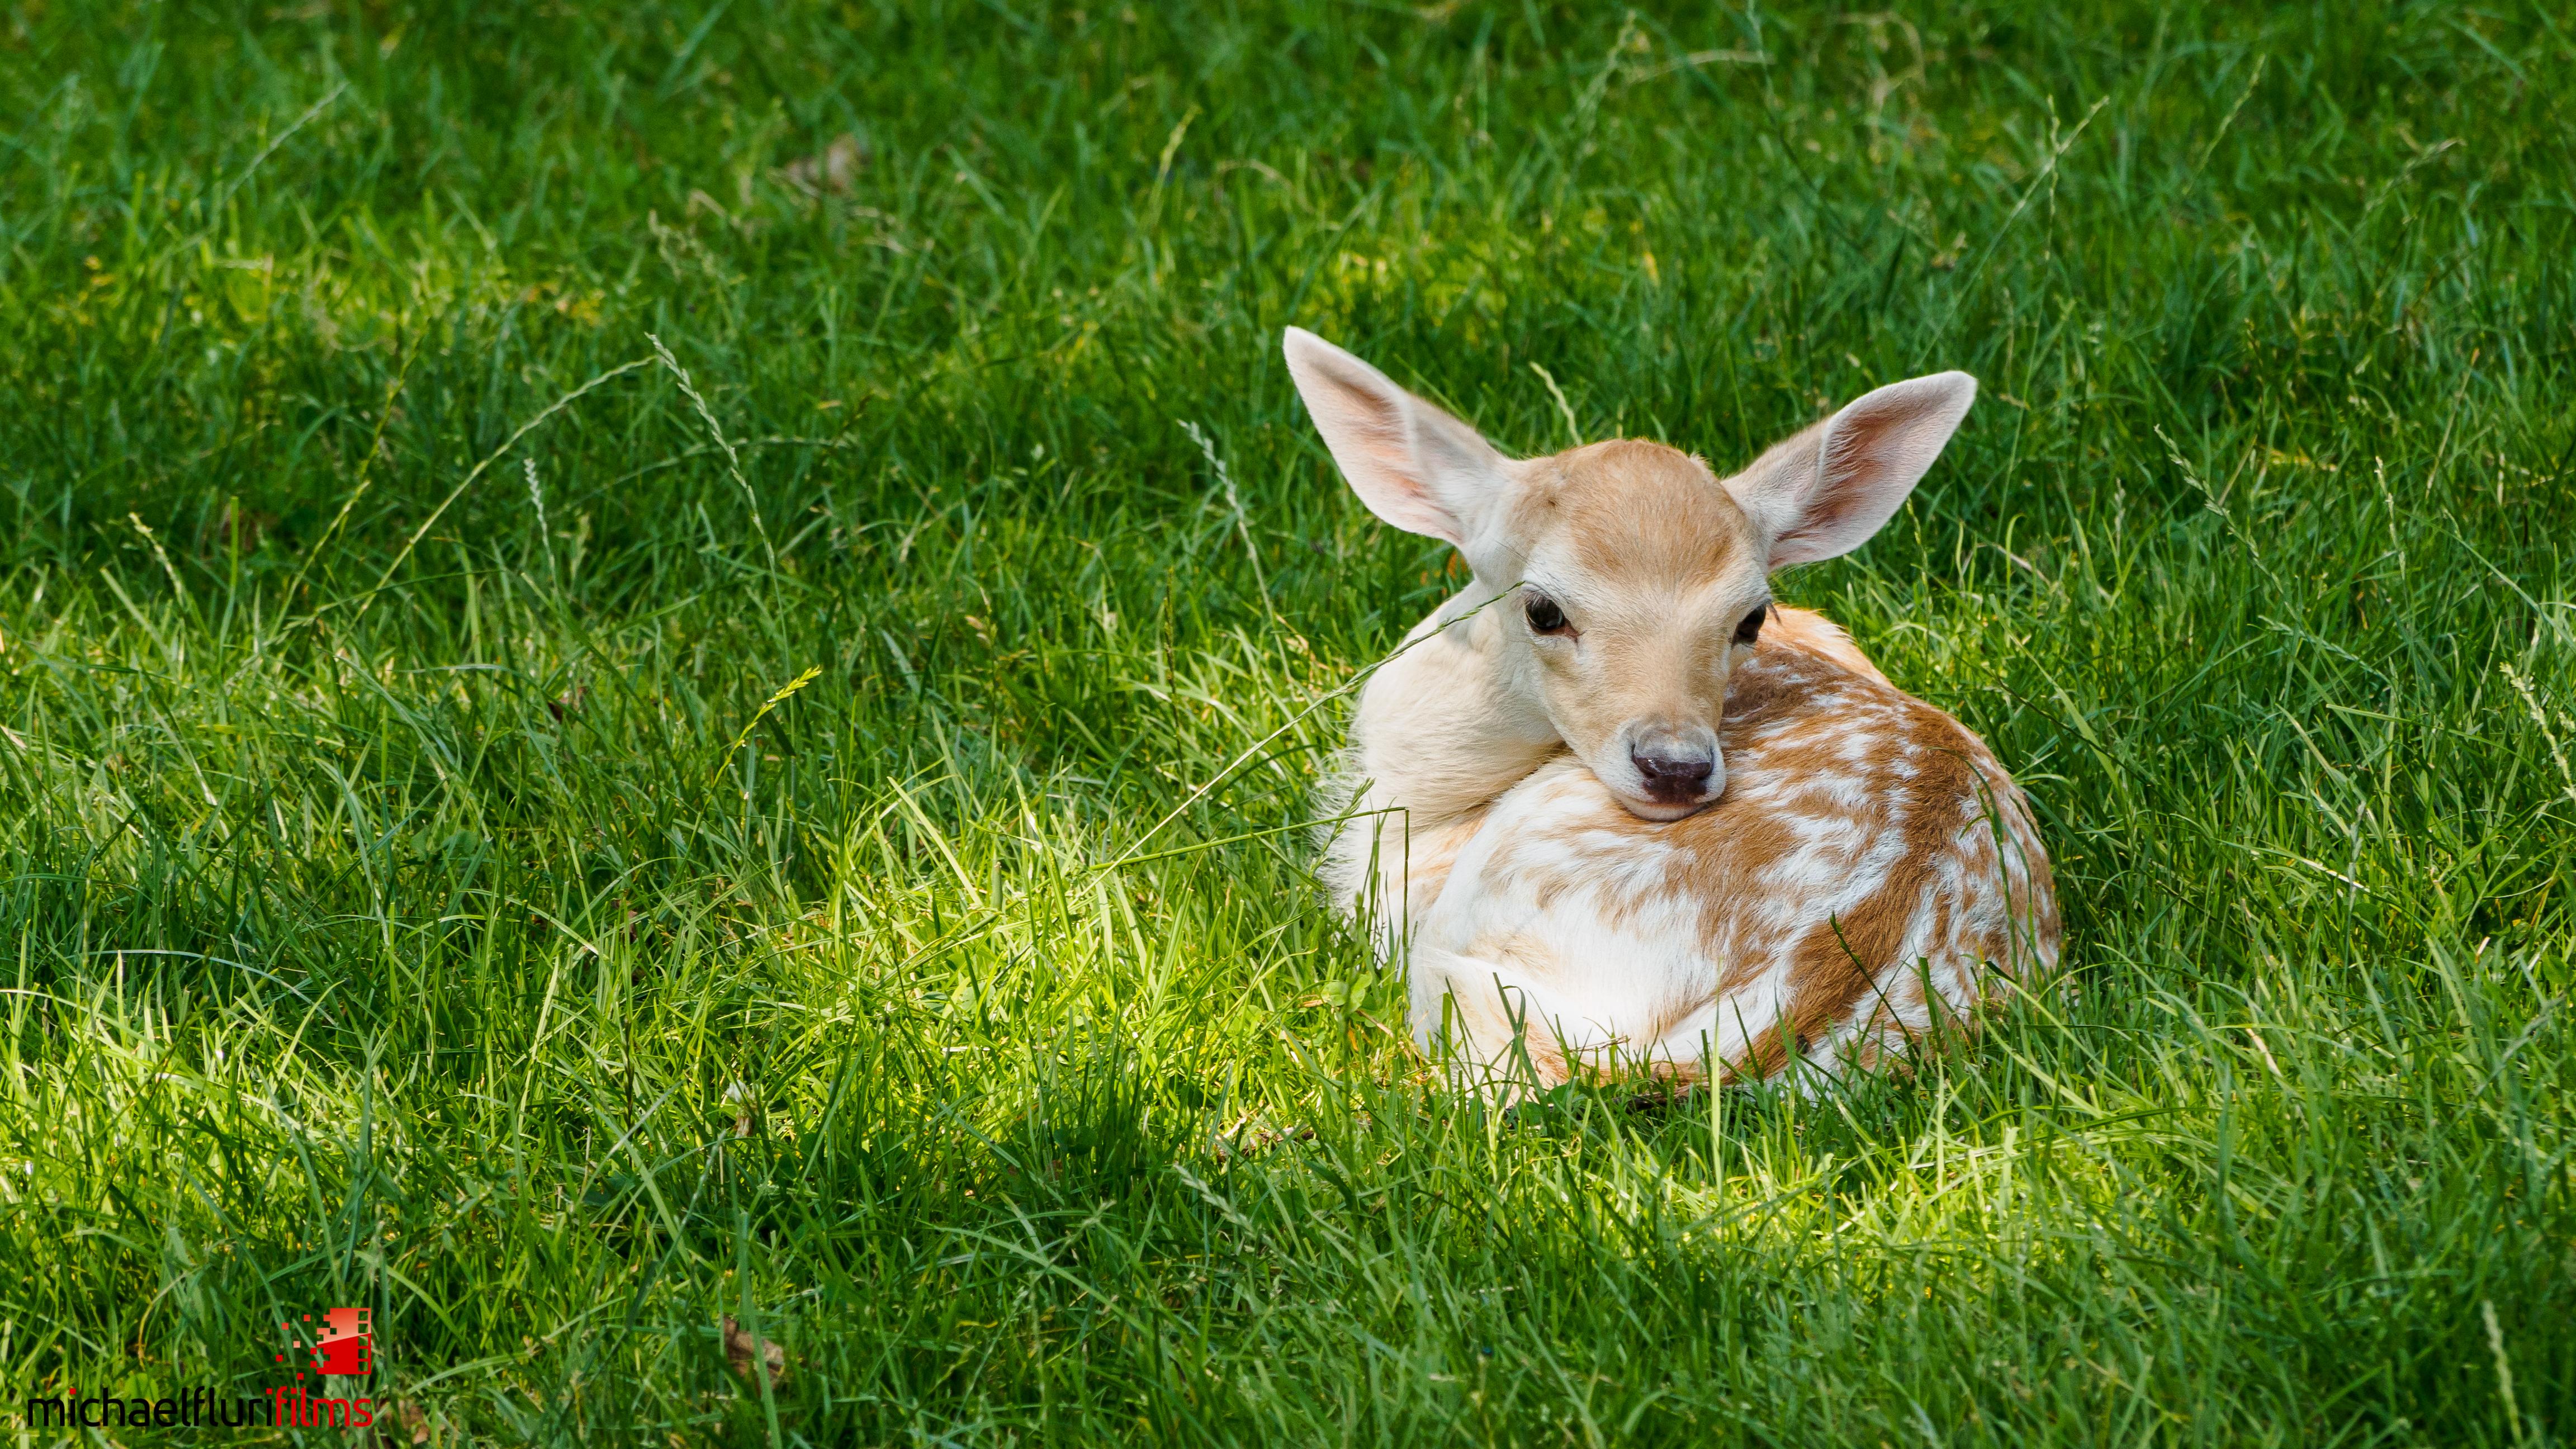 Rehkitzrettung: Rehkitz im Gras